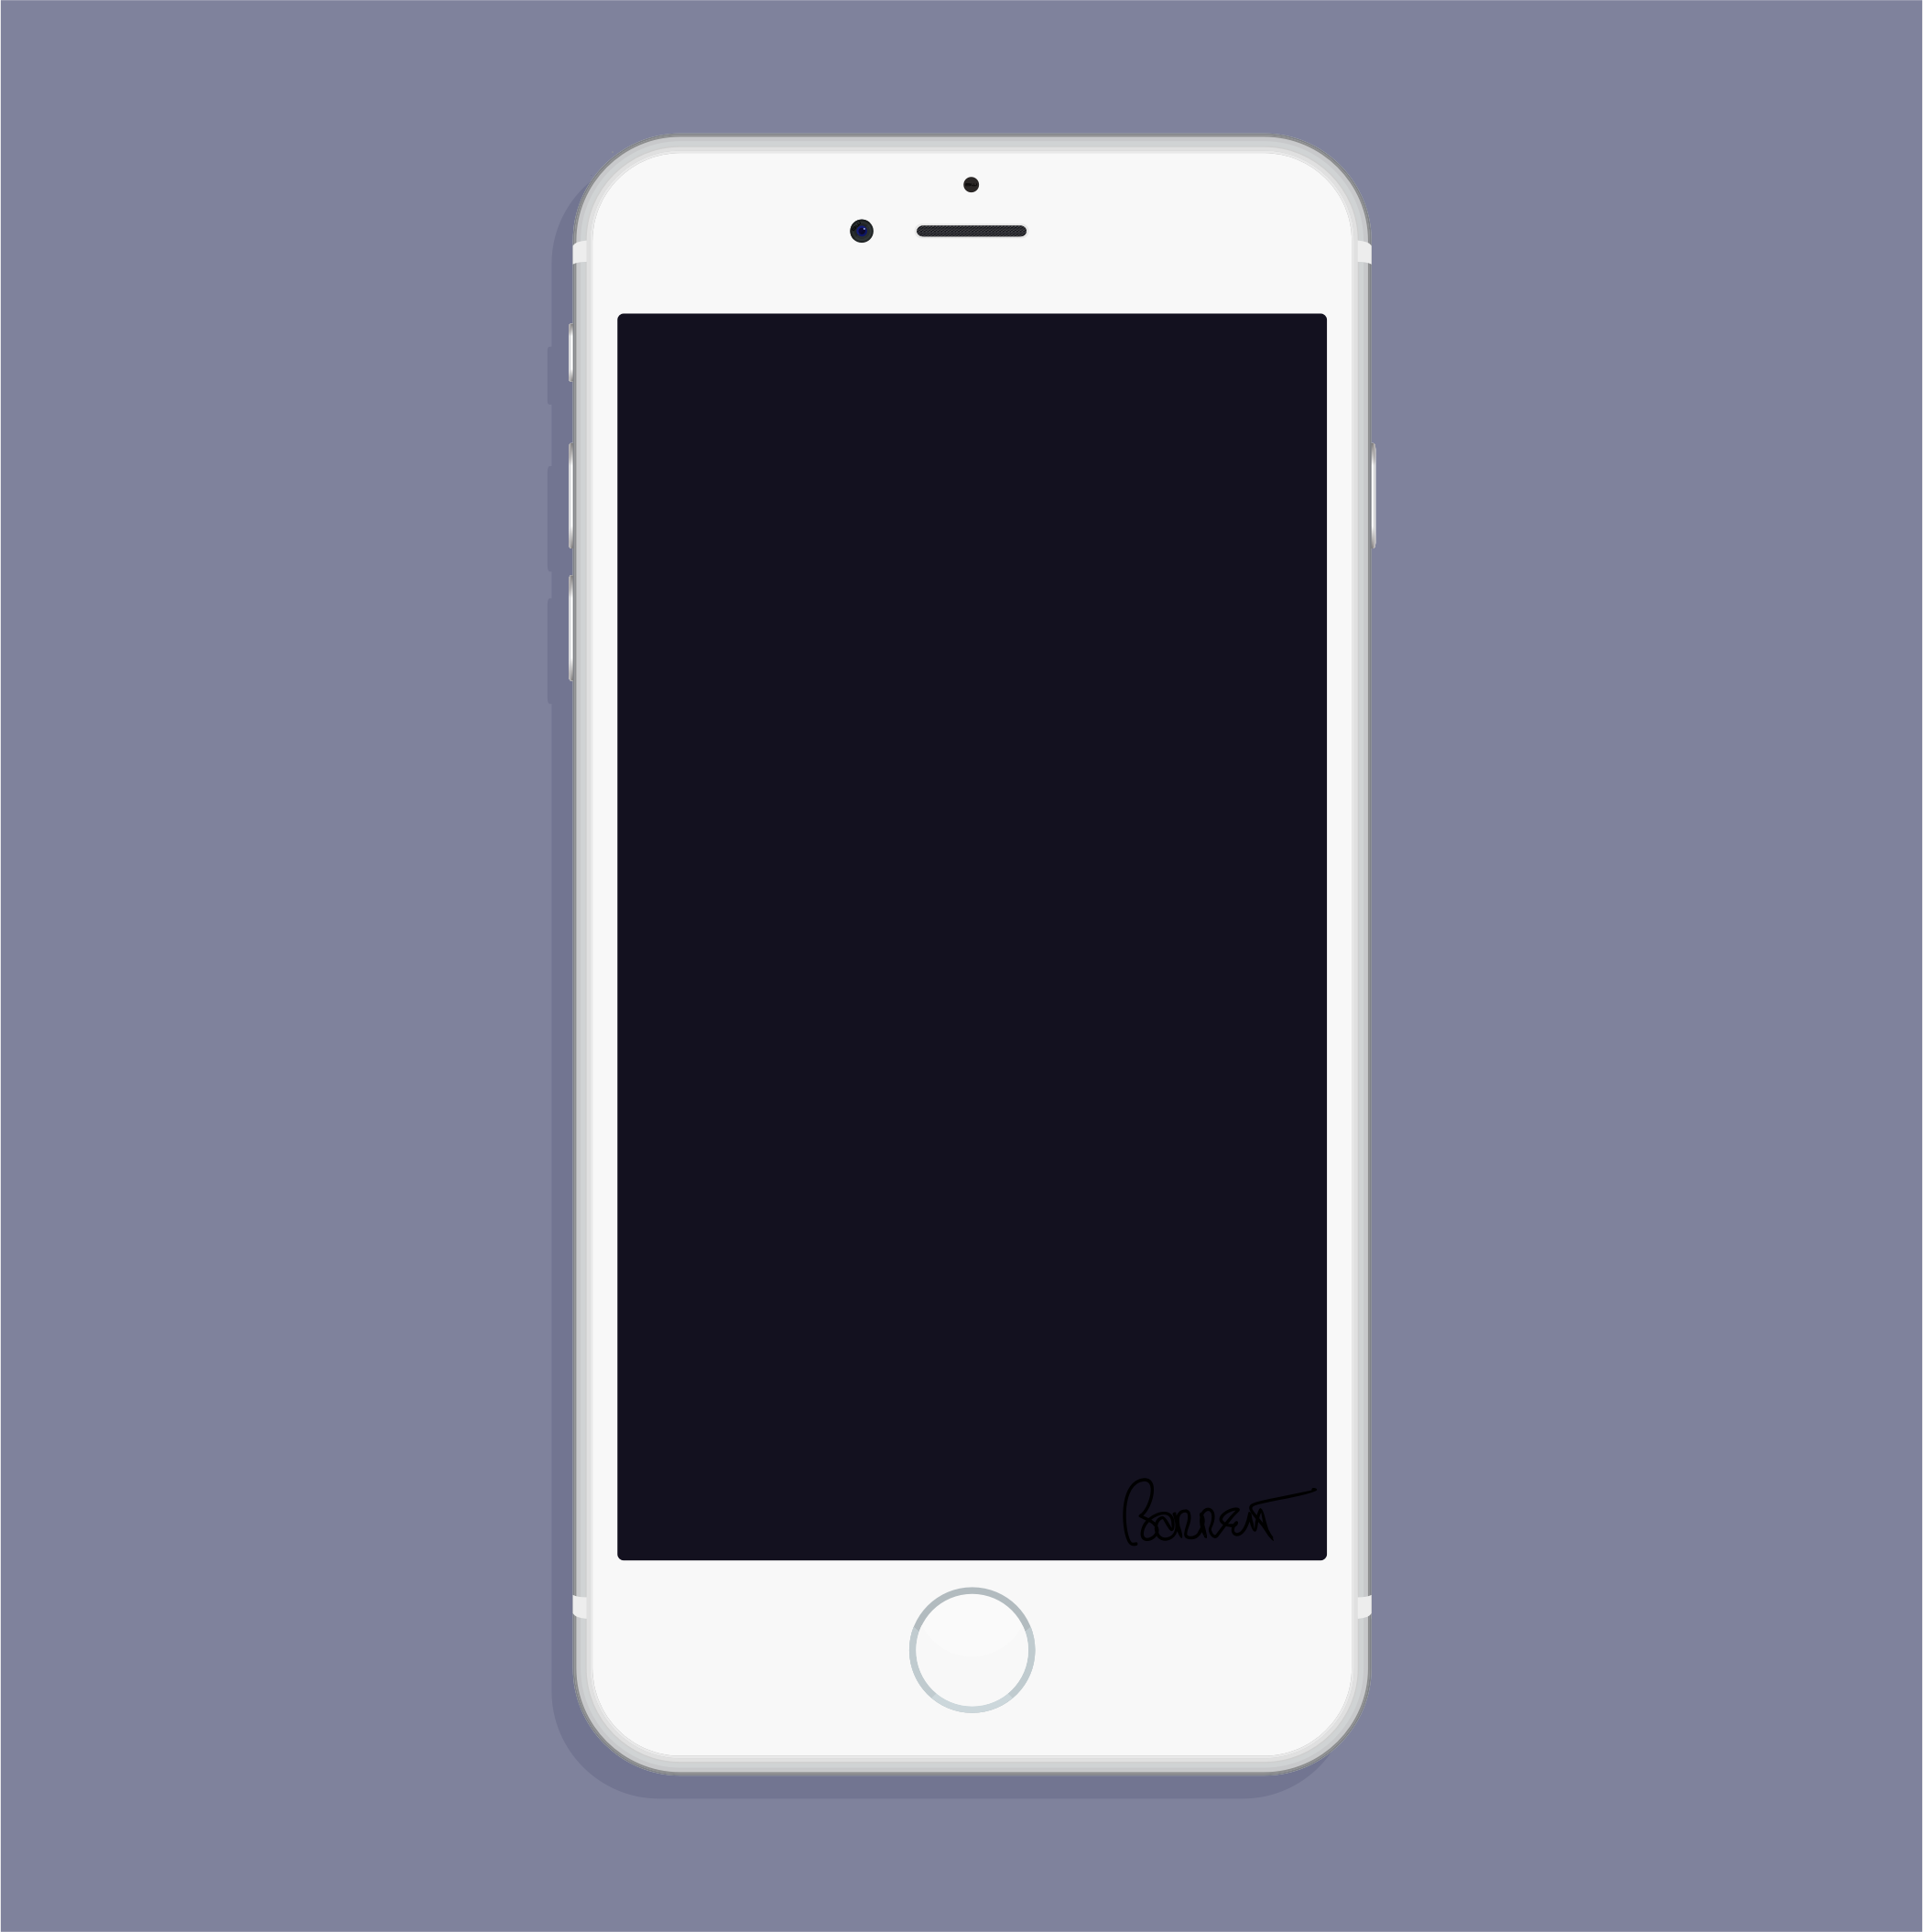 Camera clipart iphone. White new big image